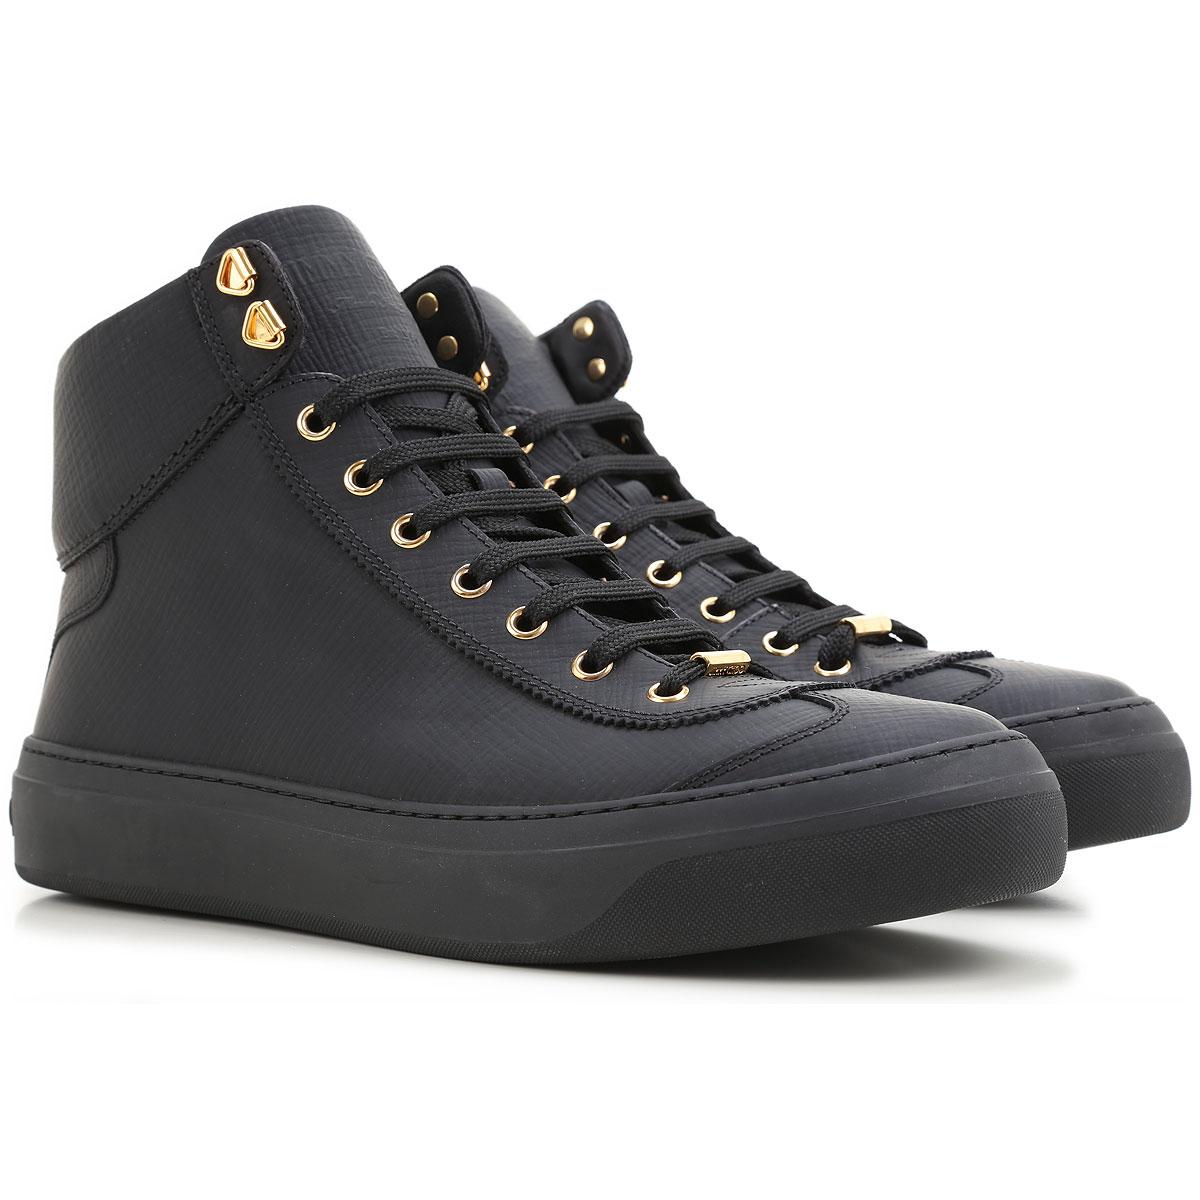 Mens Shoes Jimmy Choo, Style code